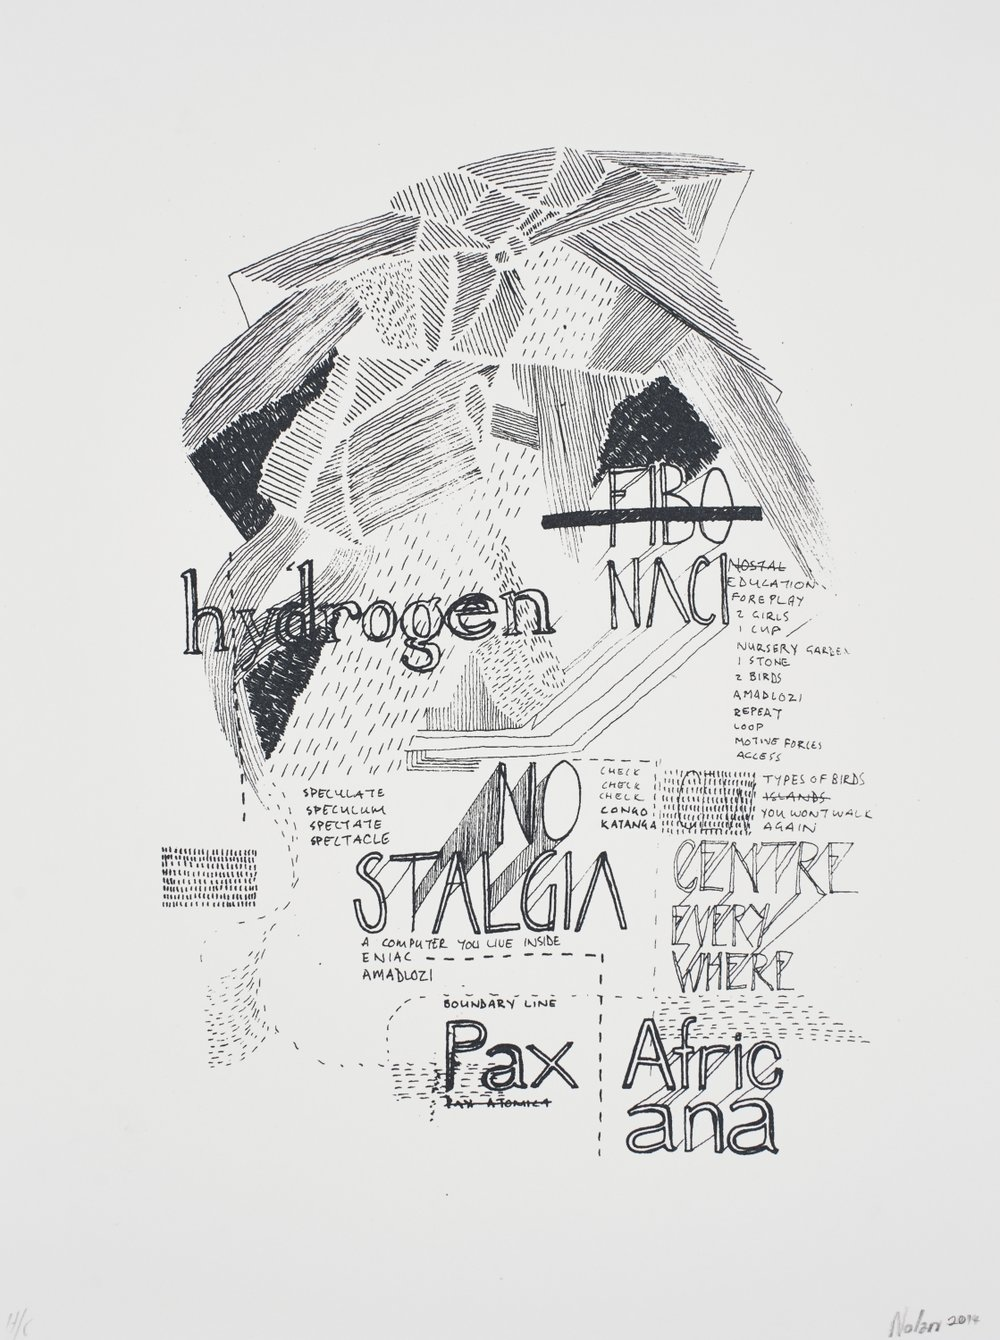 Pax Africana   Nolan Oswald Dennis  Silkscreen on paper  Edition of 44  R 3 200.00 excl. vat